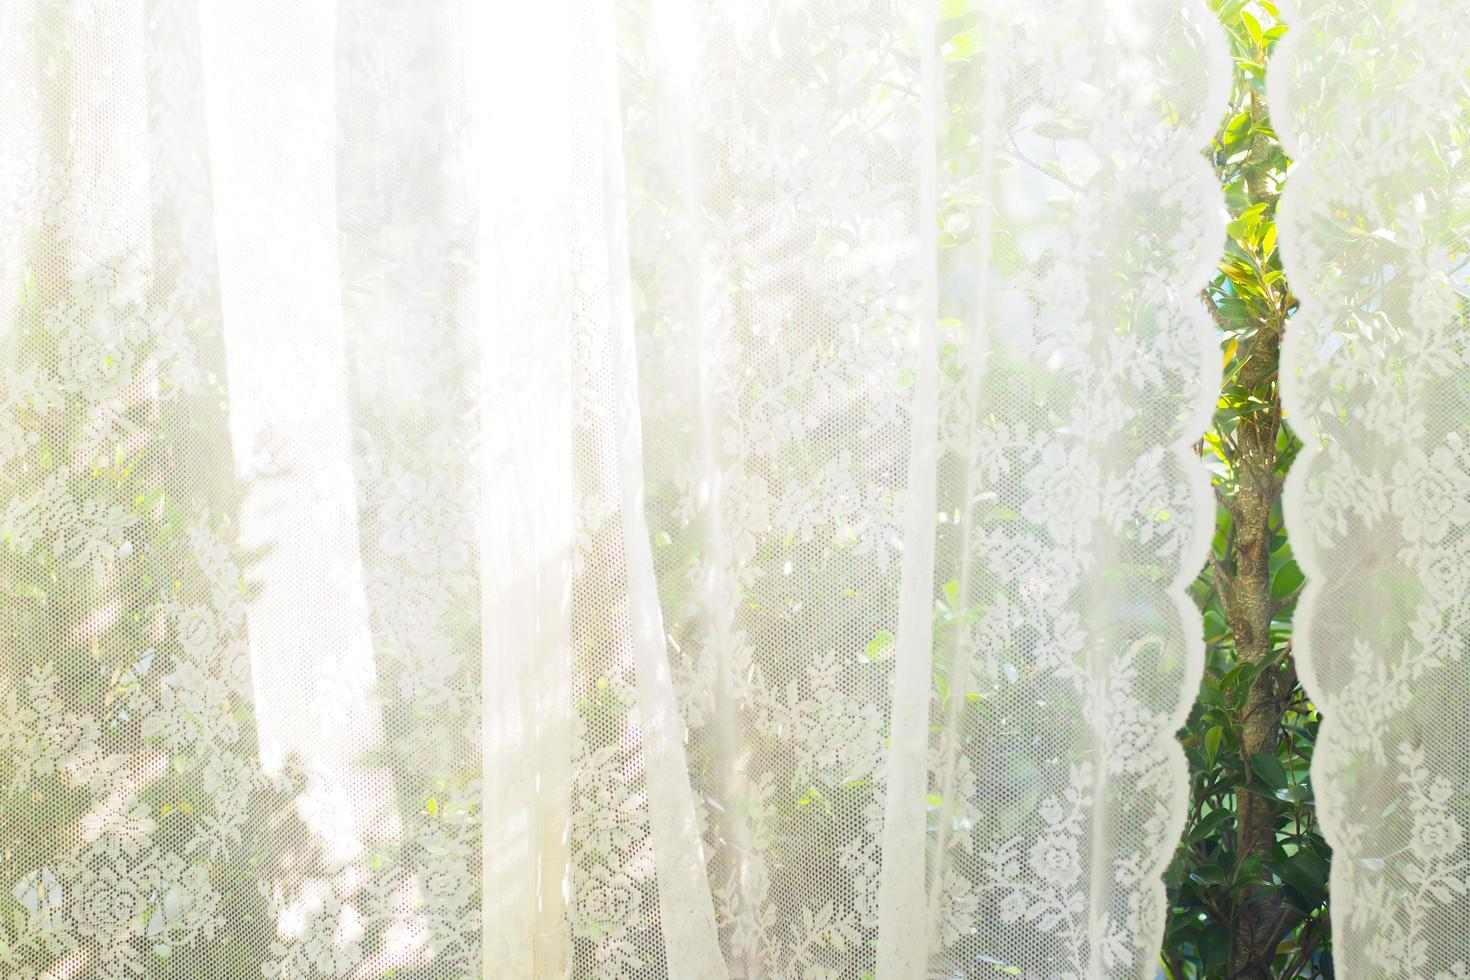 cortina blanca con vista a la ventana foto